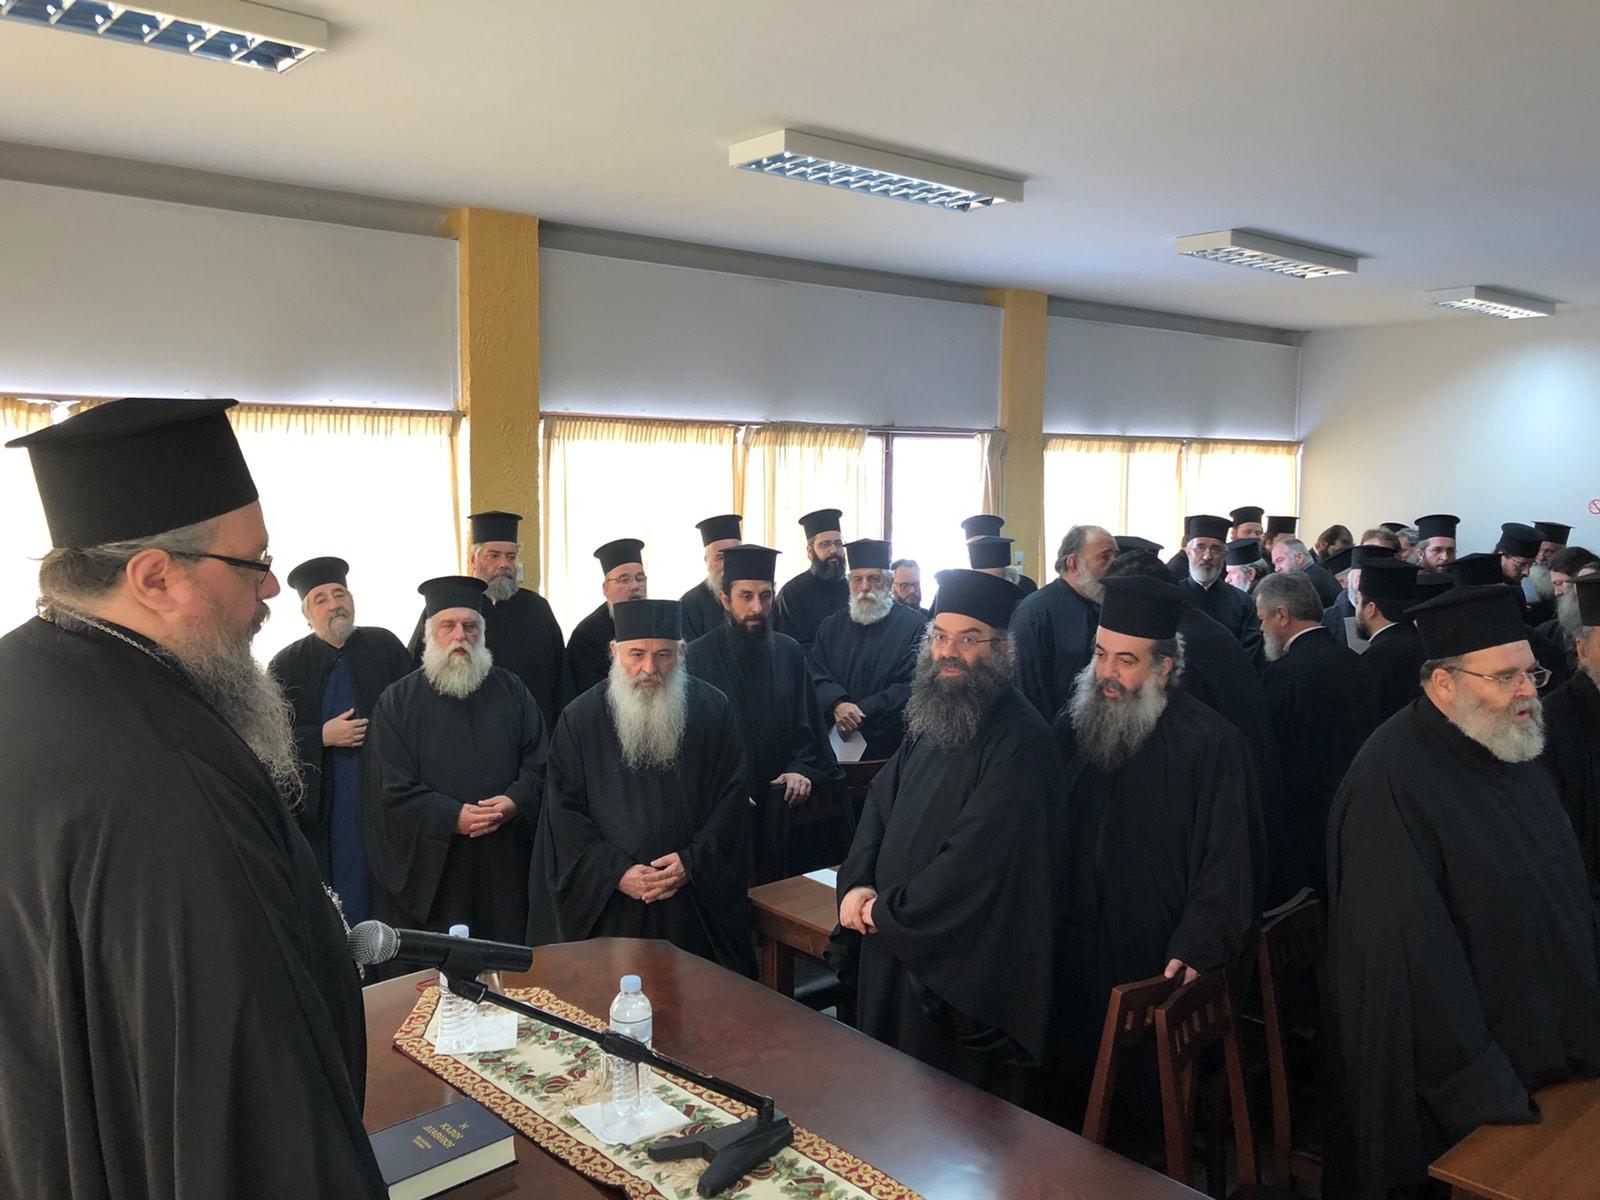 synaksi febrouariou 3 - Ιερατική Σύναξη στο Μελισσοχώρι (φωτο)